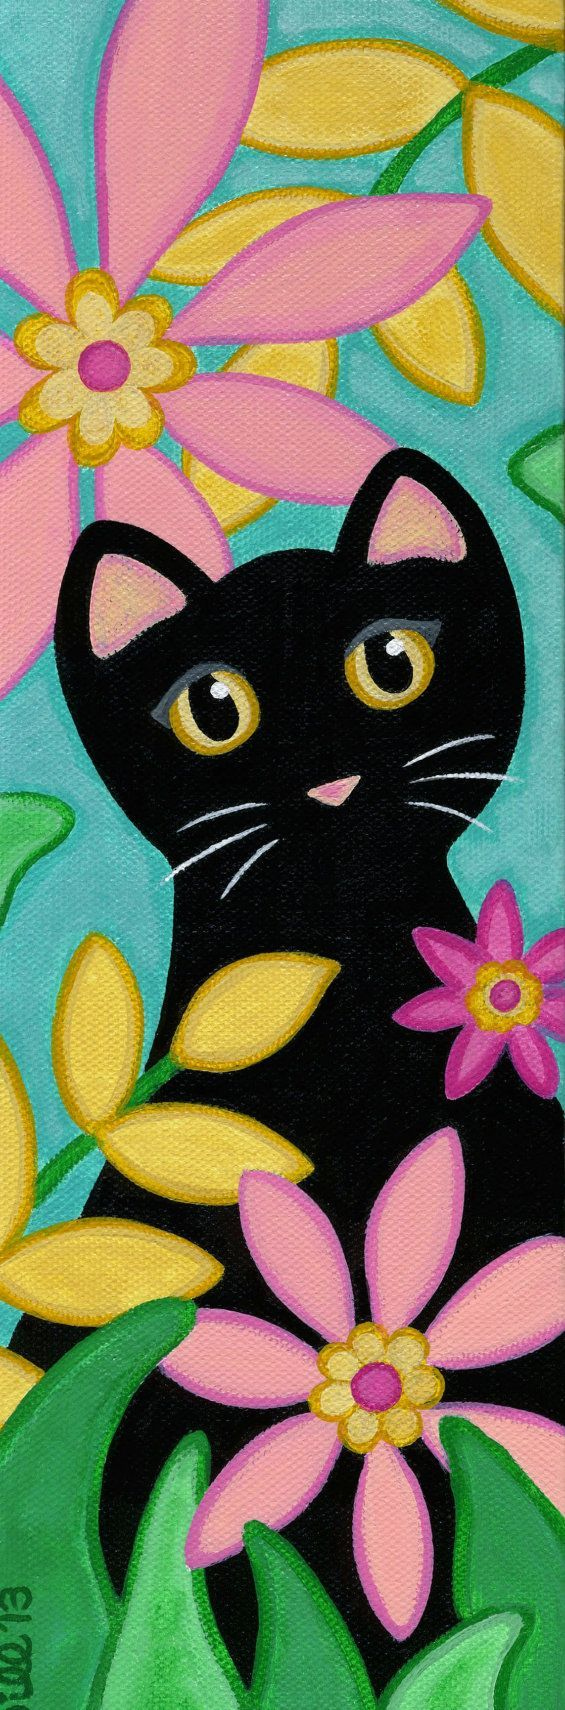 Cat Folk Art Painting by Jill of #thatsmycat on Etsy♥•♥•♥